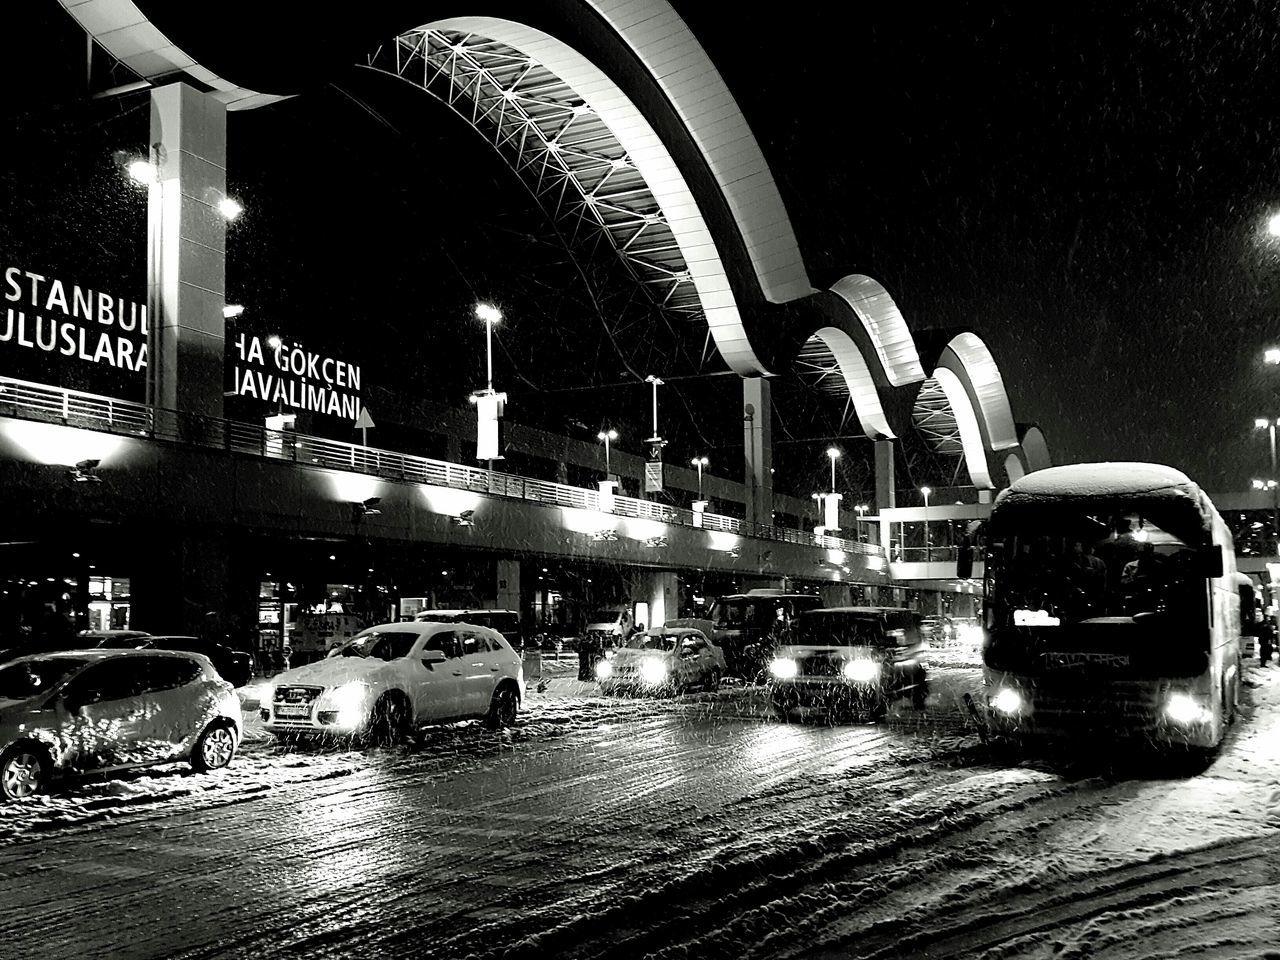 Istanbul Sabihagökçenhavalimanı Snow Sabiha Gökçen International Airport Sabihagokcen Adapted To The City